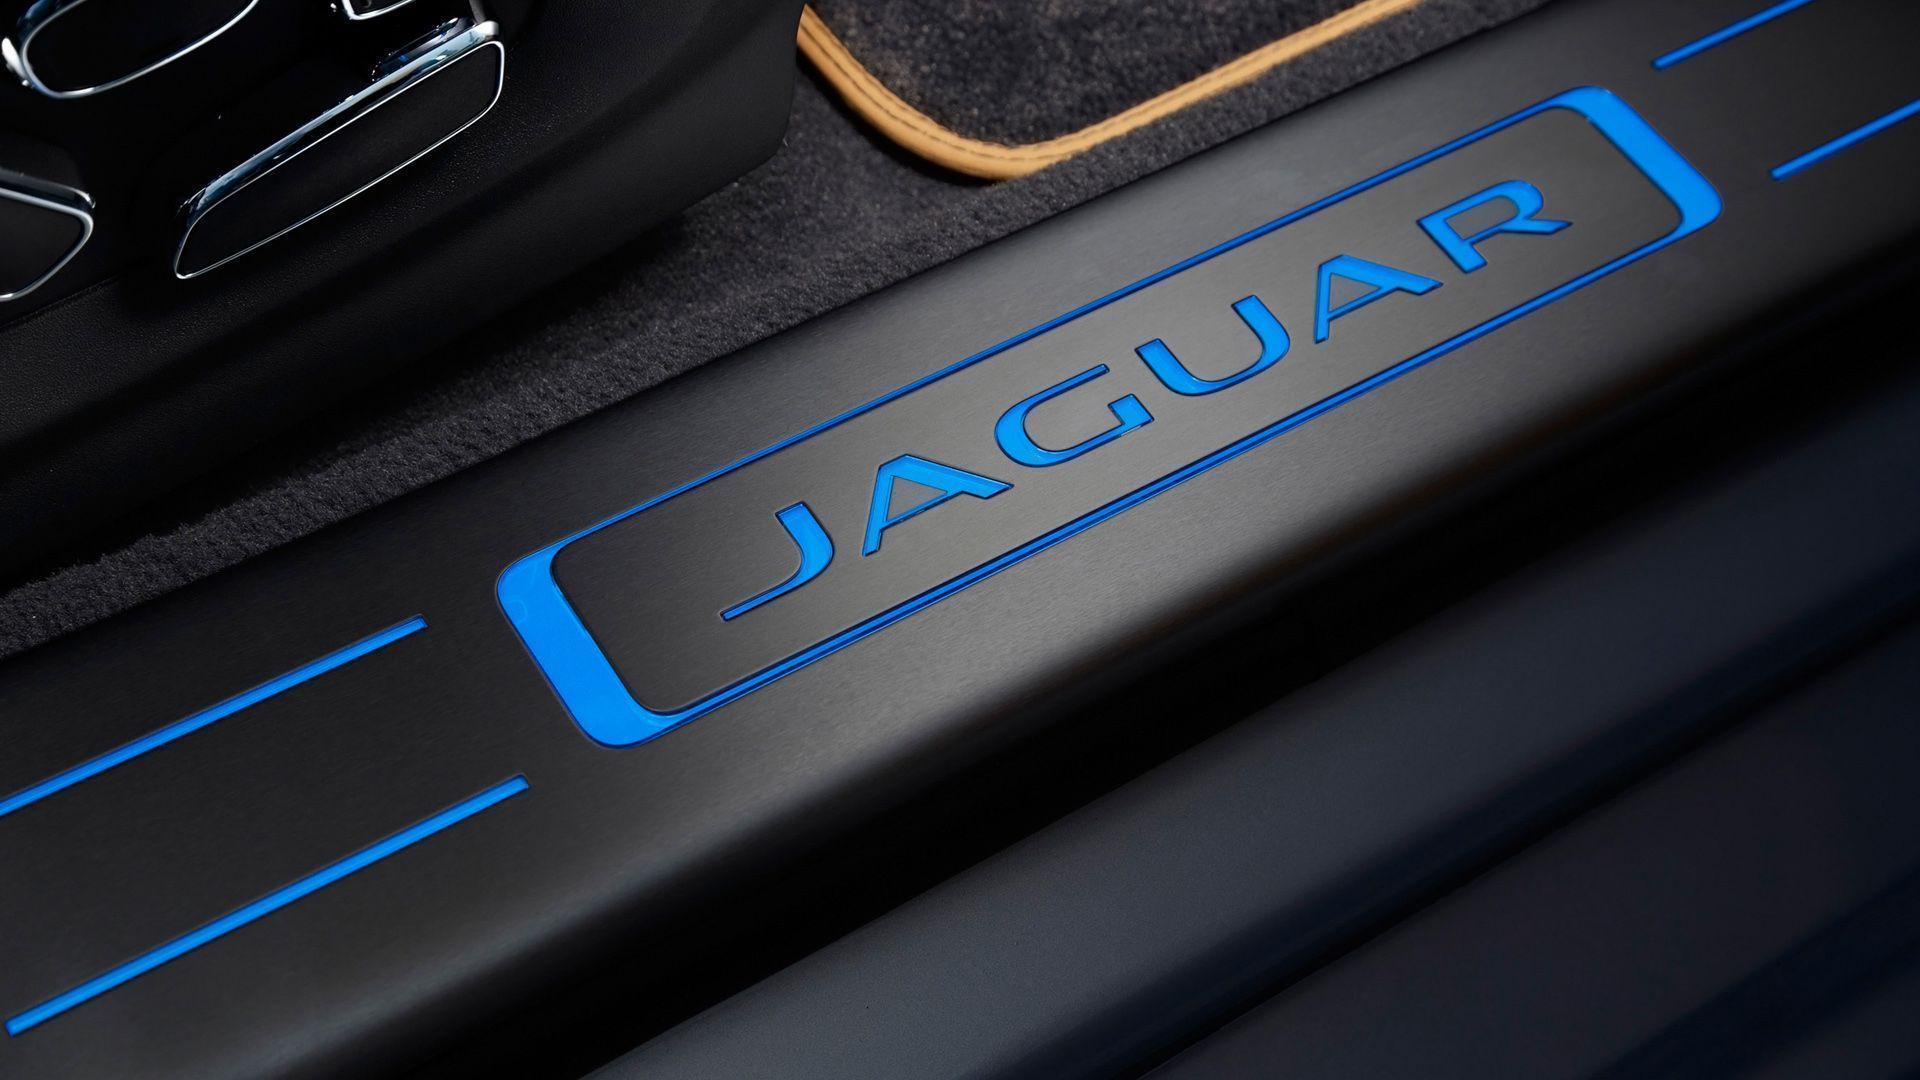 1080p Jaguar Car Wallpaper HD